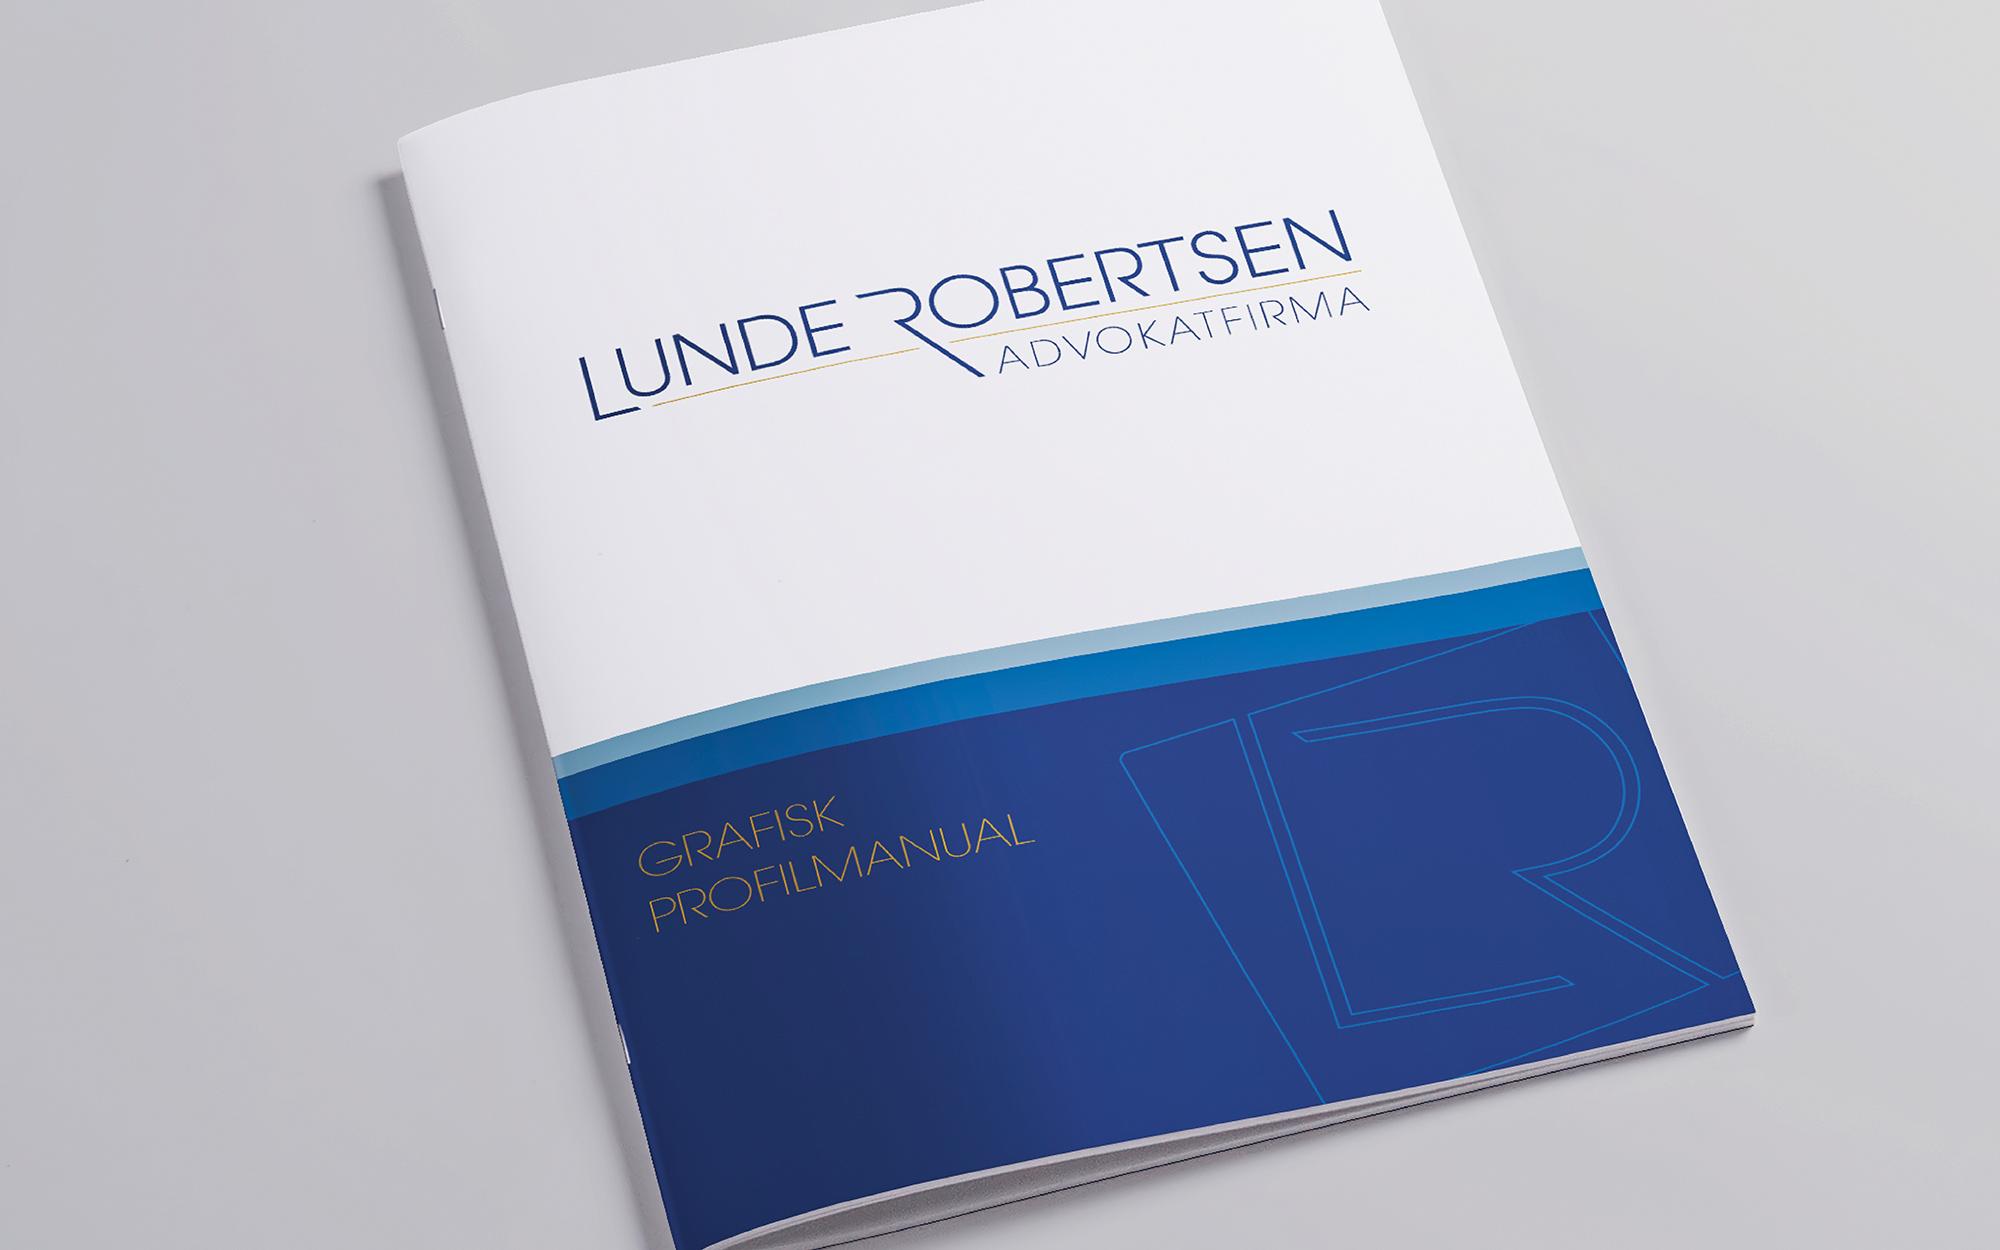 Lunde Robertsen profilmanual